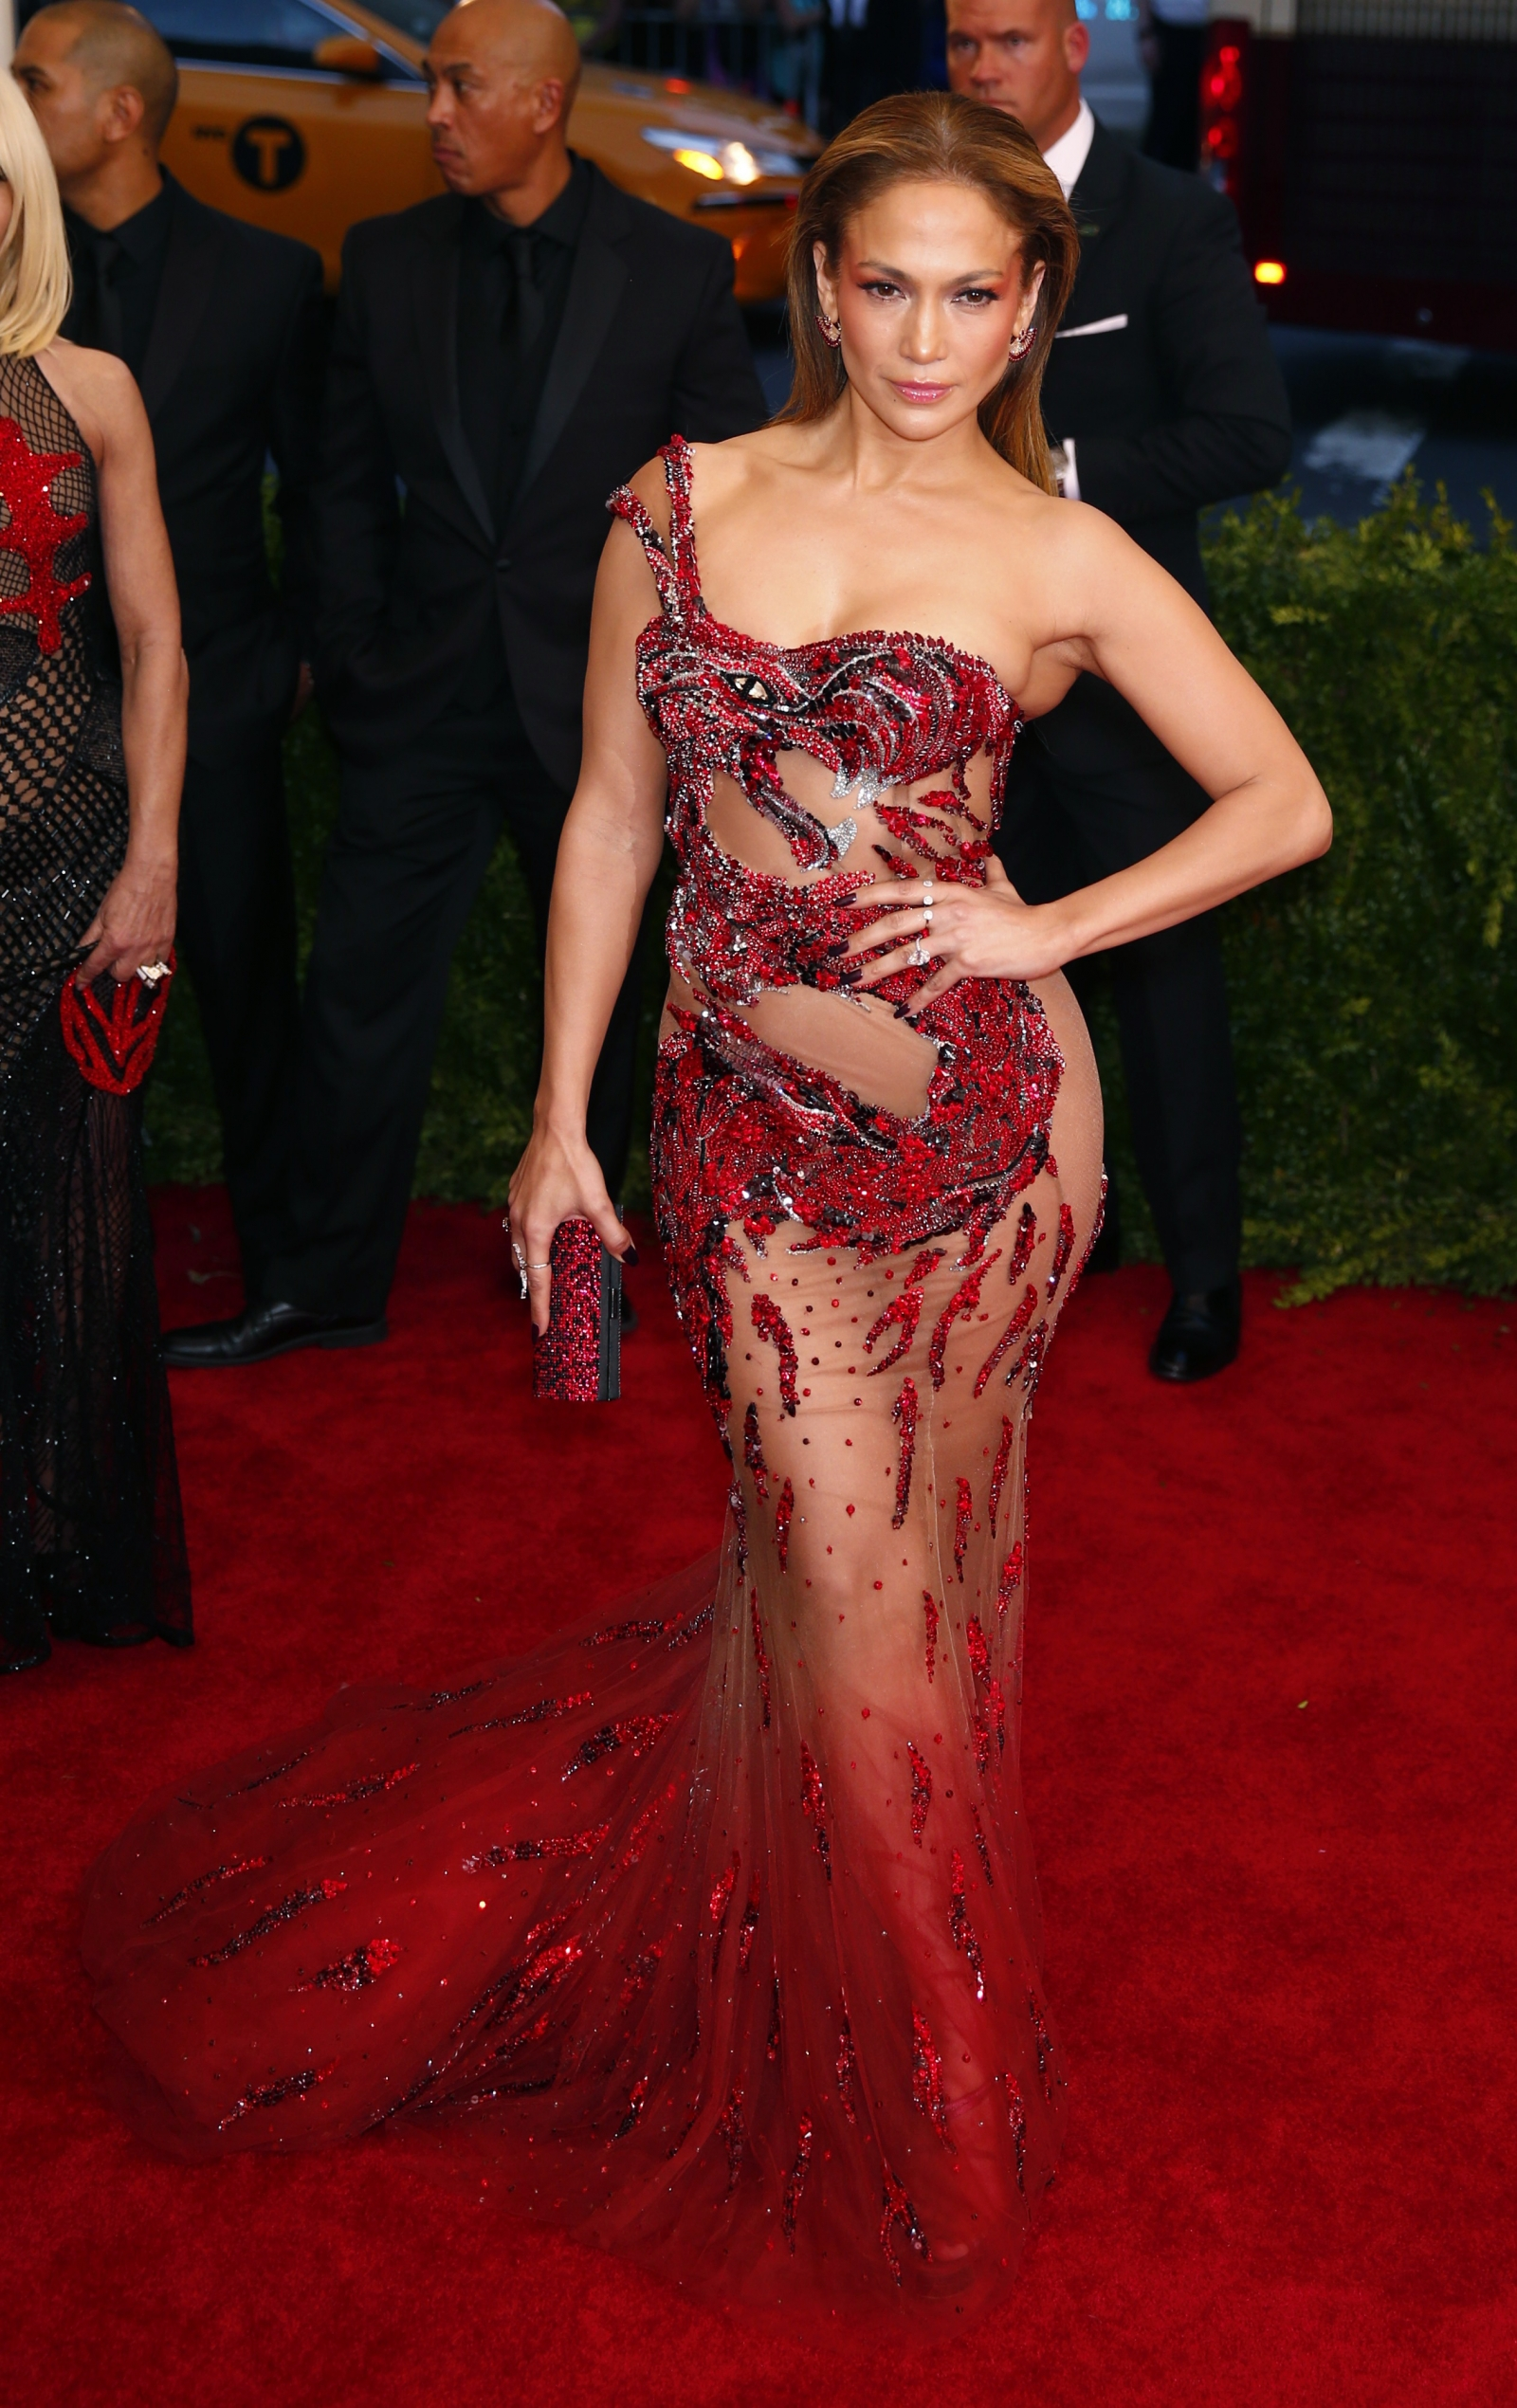 Jennifer Lopez at the Met Gala 2015